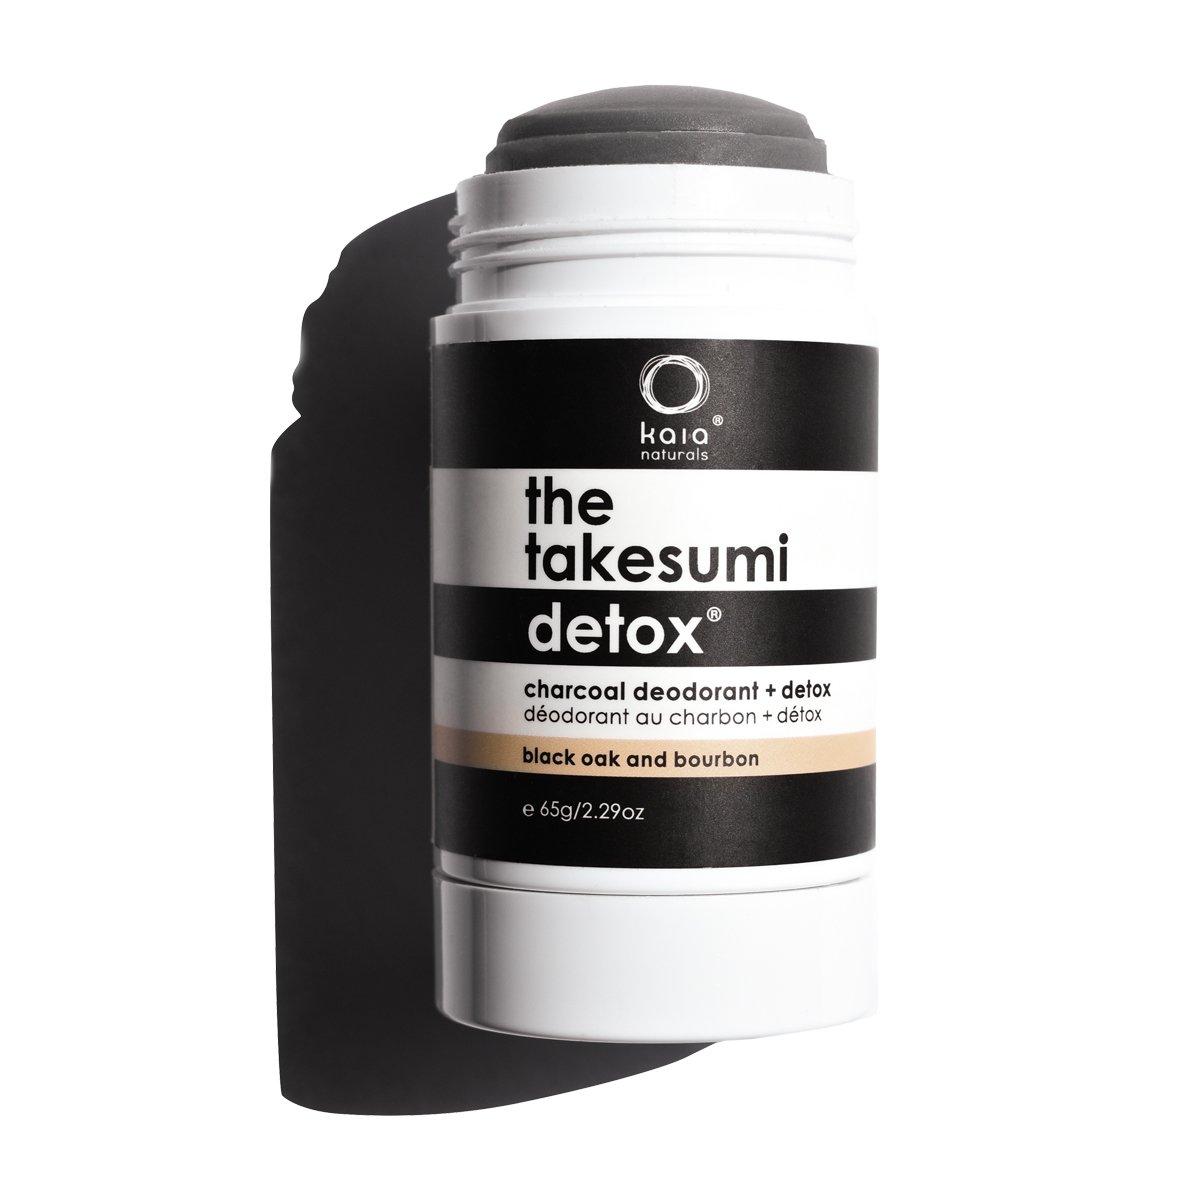 The Takesumi Detox Charcoal Deodorant